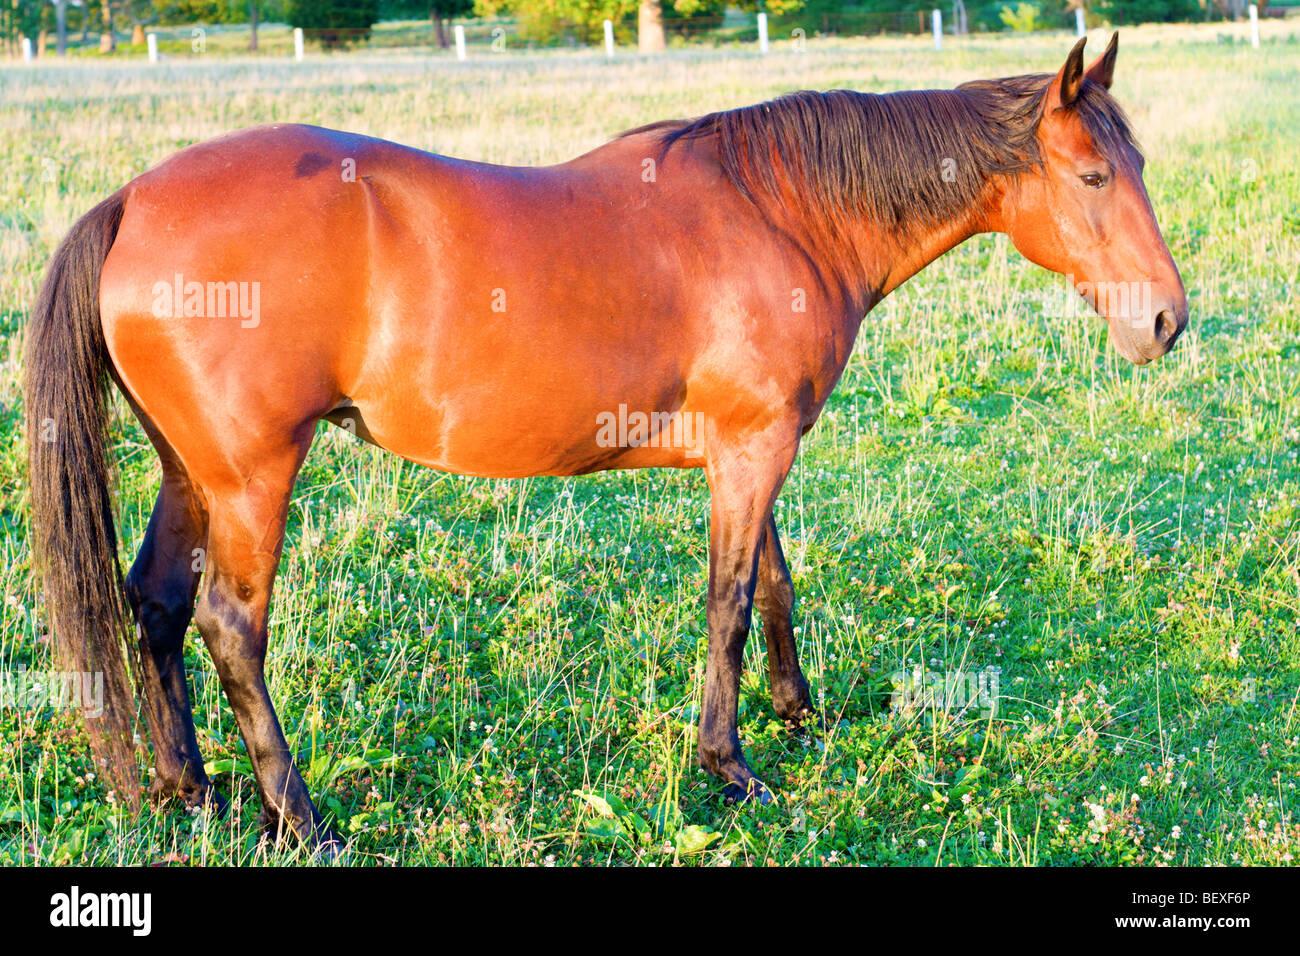 Horse Photo Stock